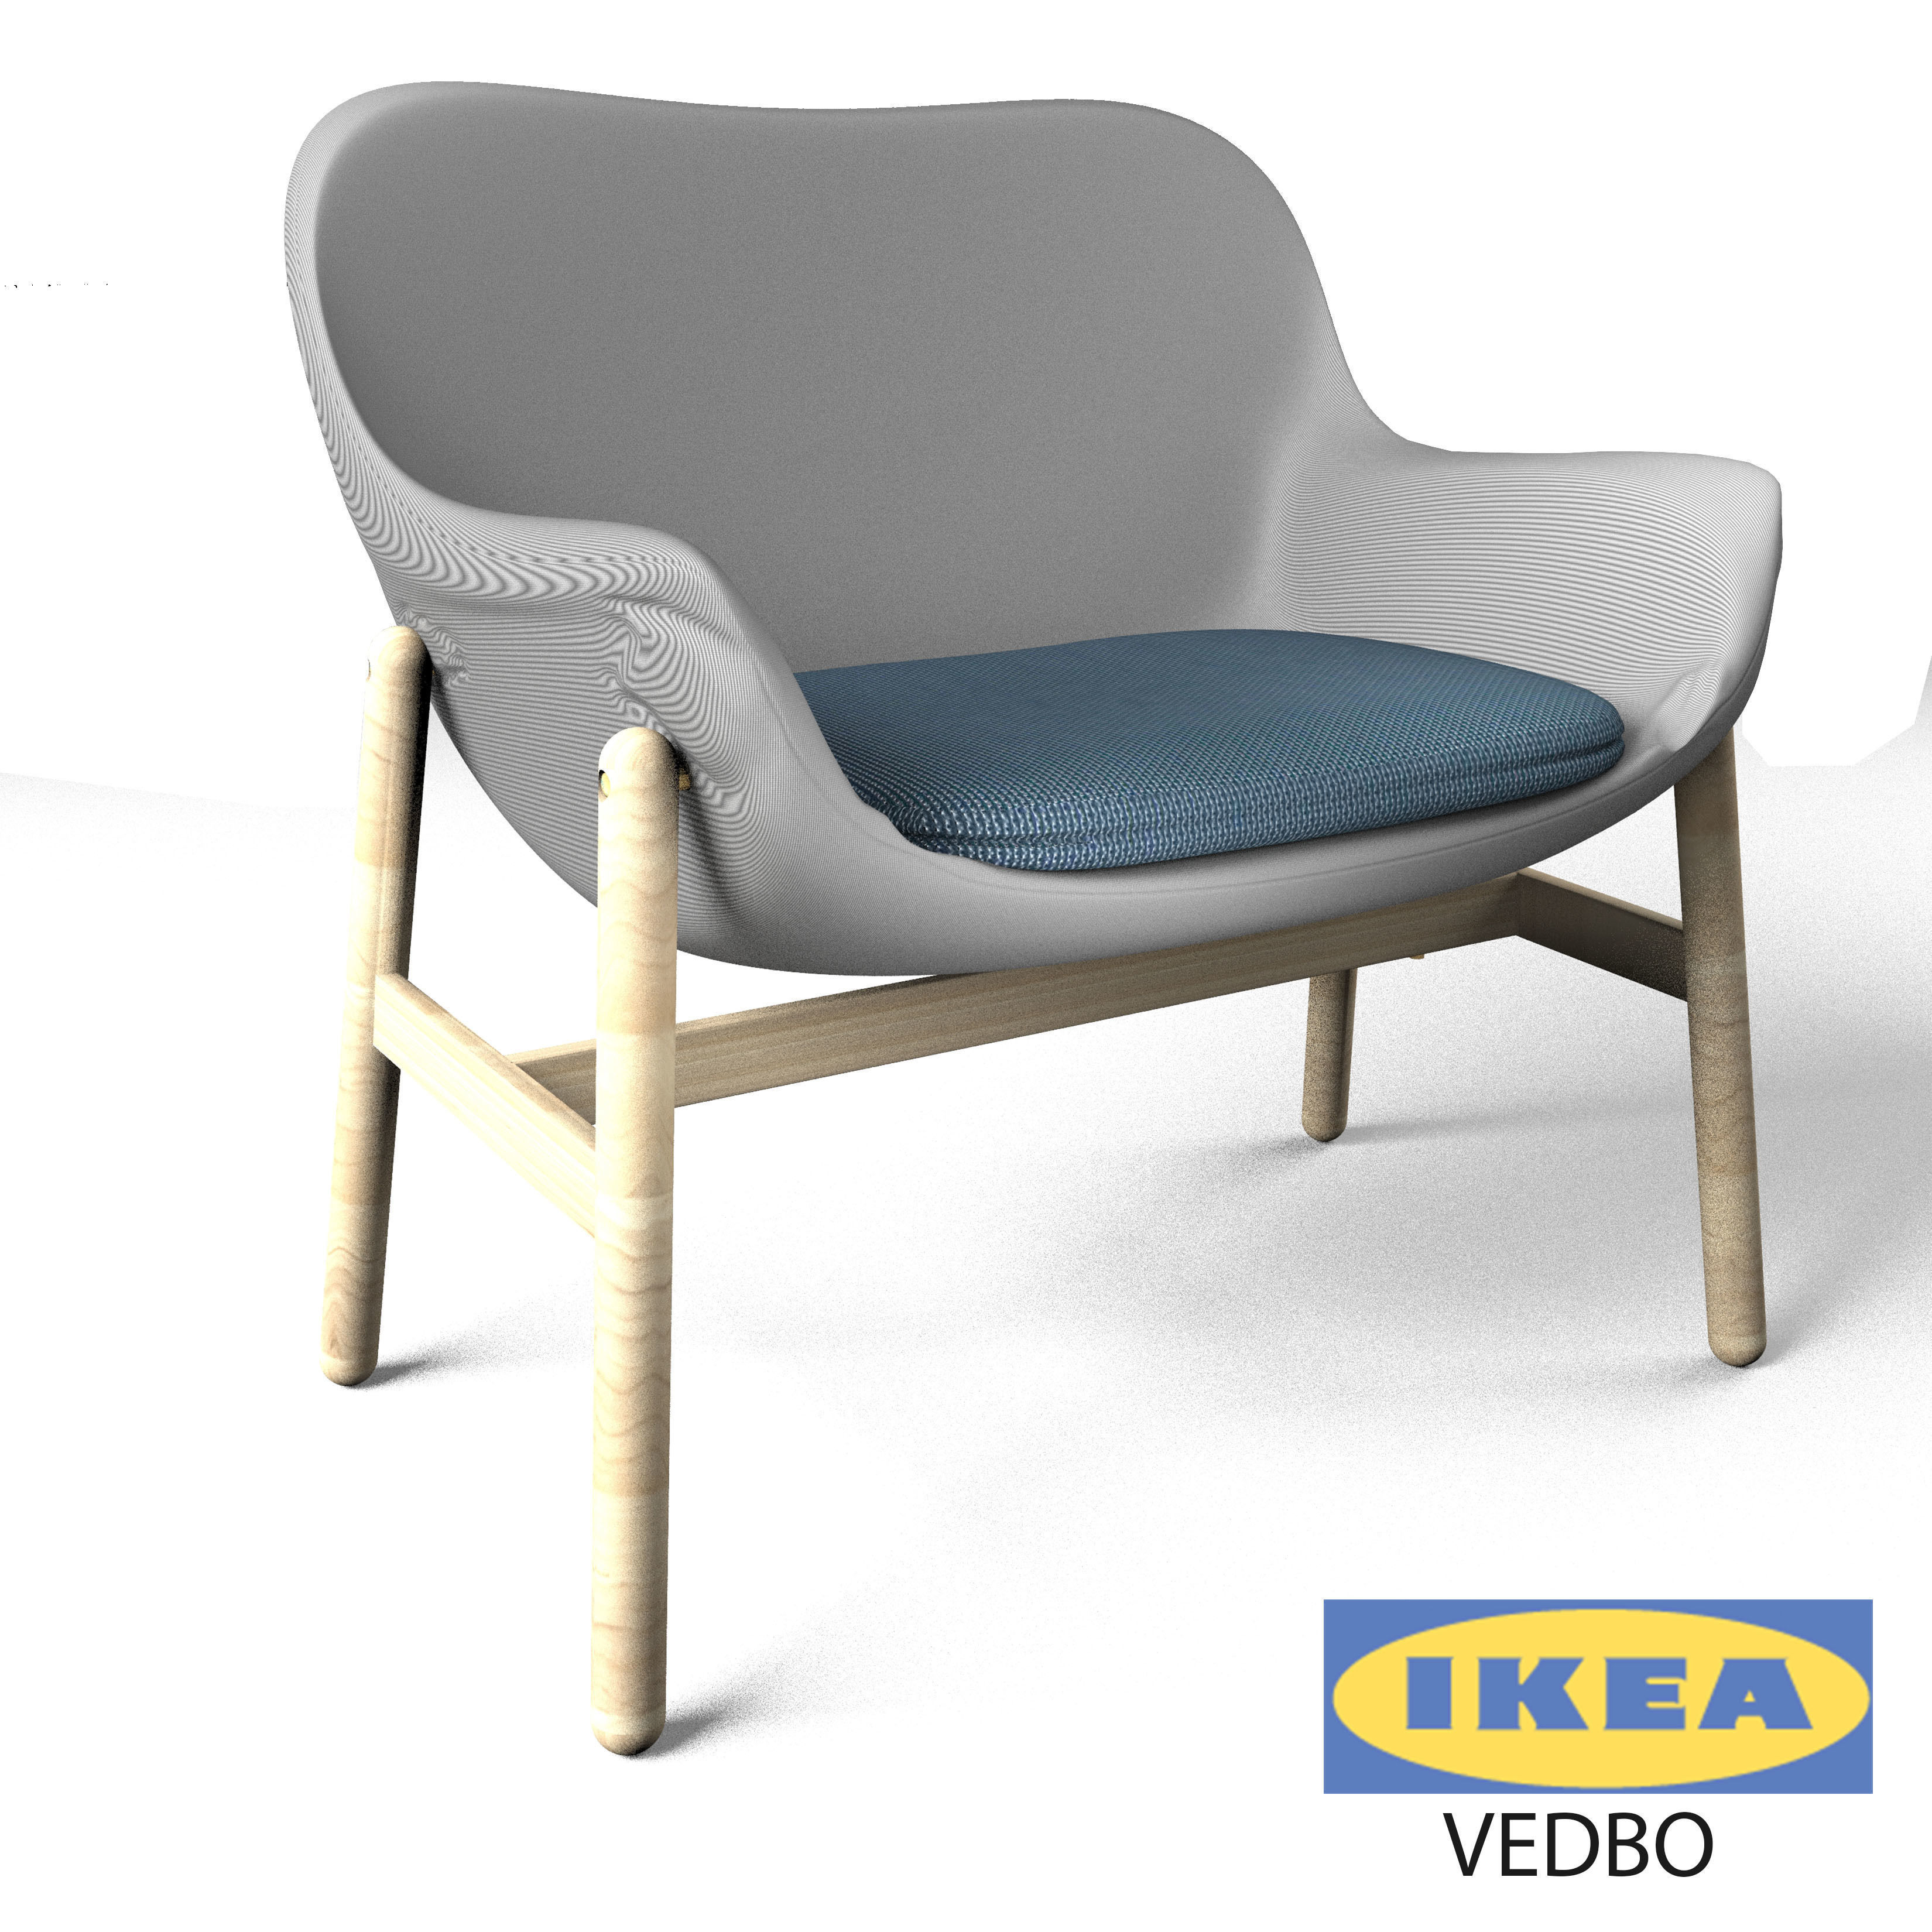 Ikea Arm Chair 3d Model Max Obj Fbx Mtl Mat 1